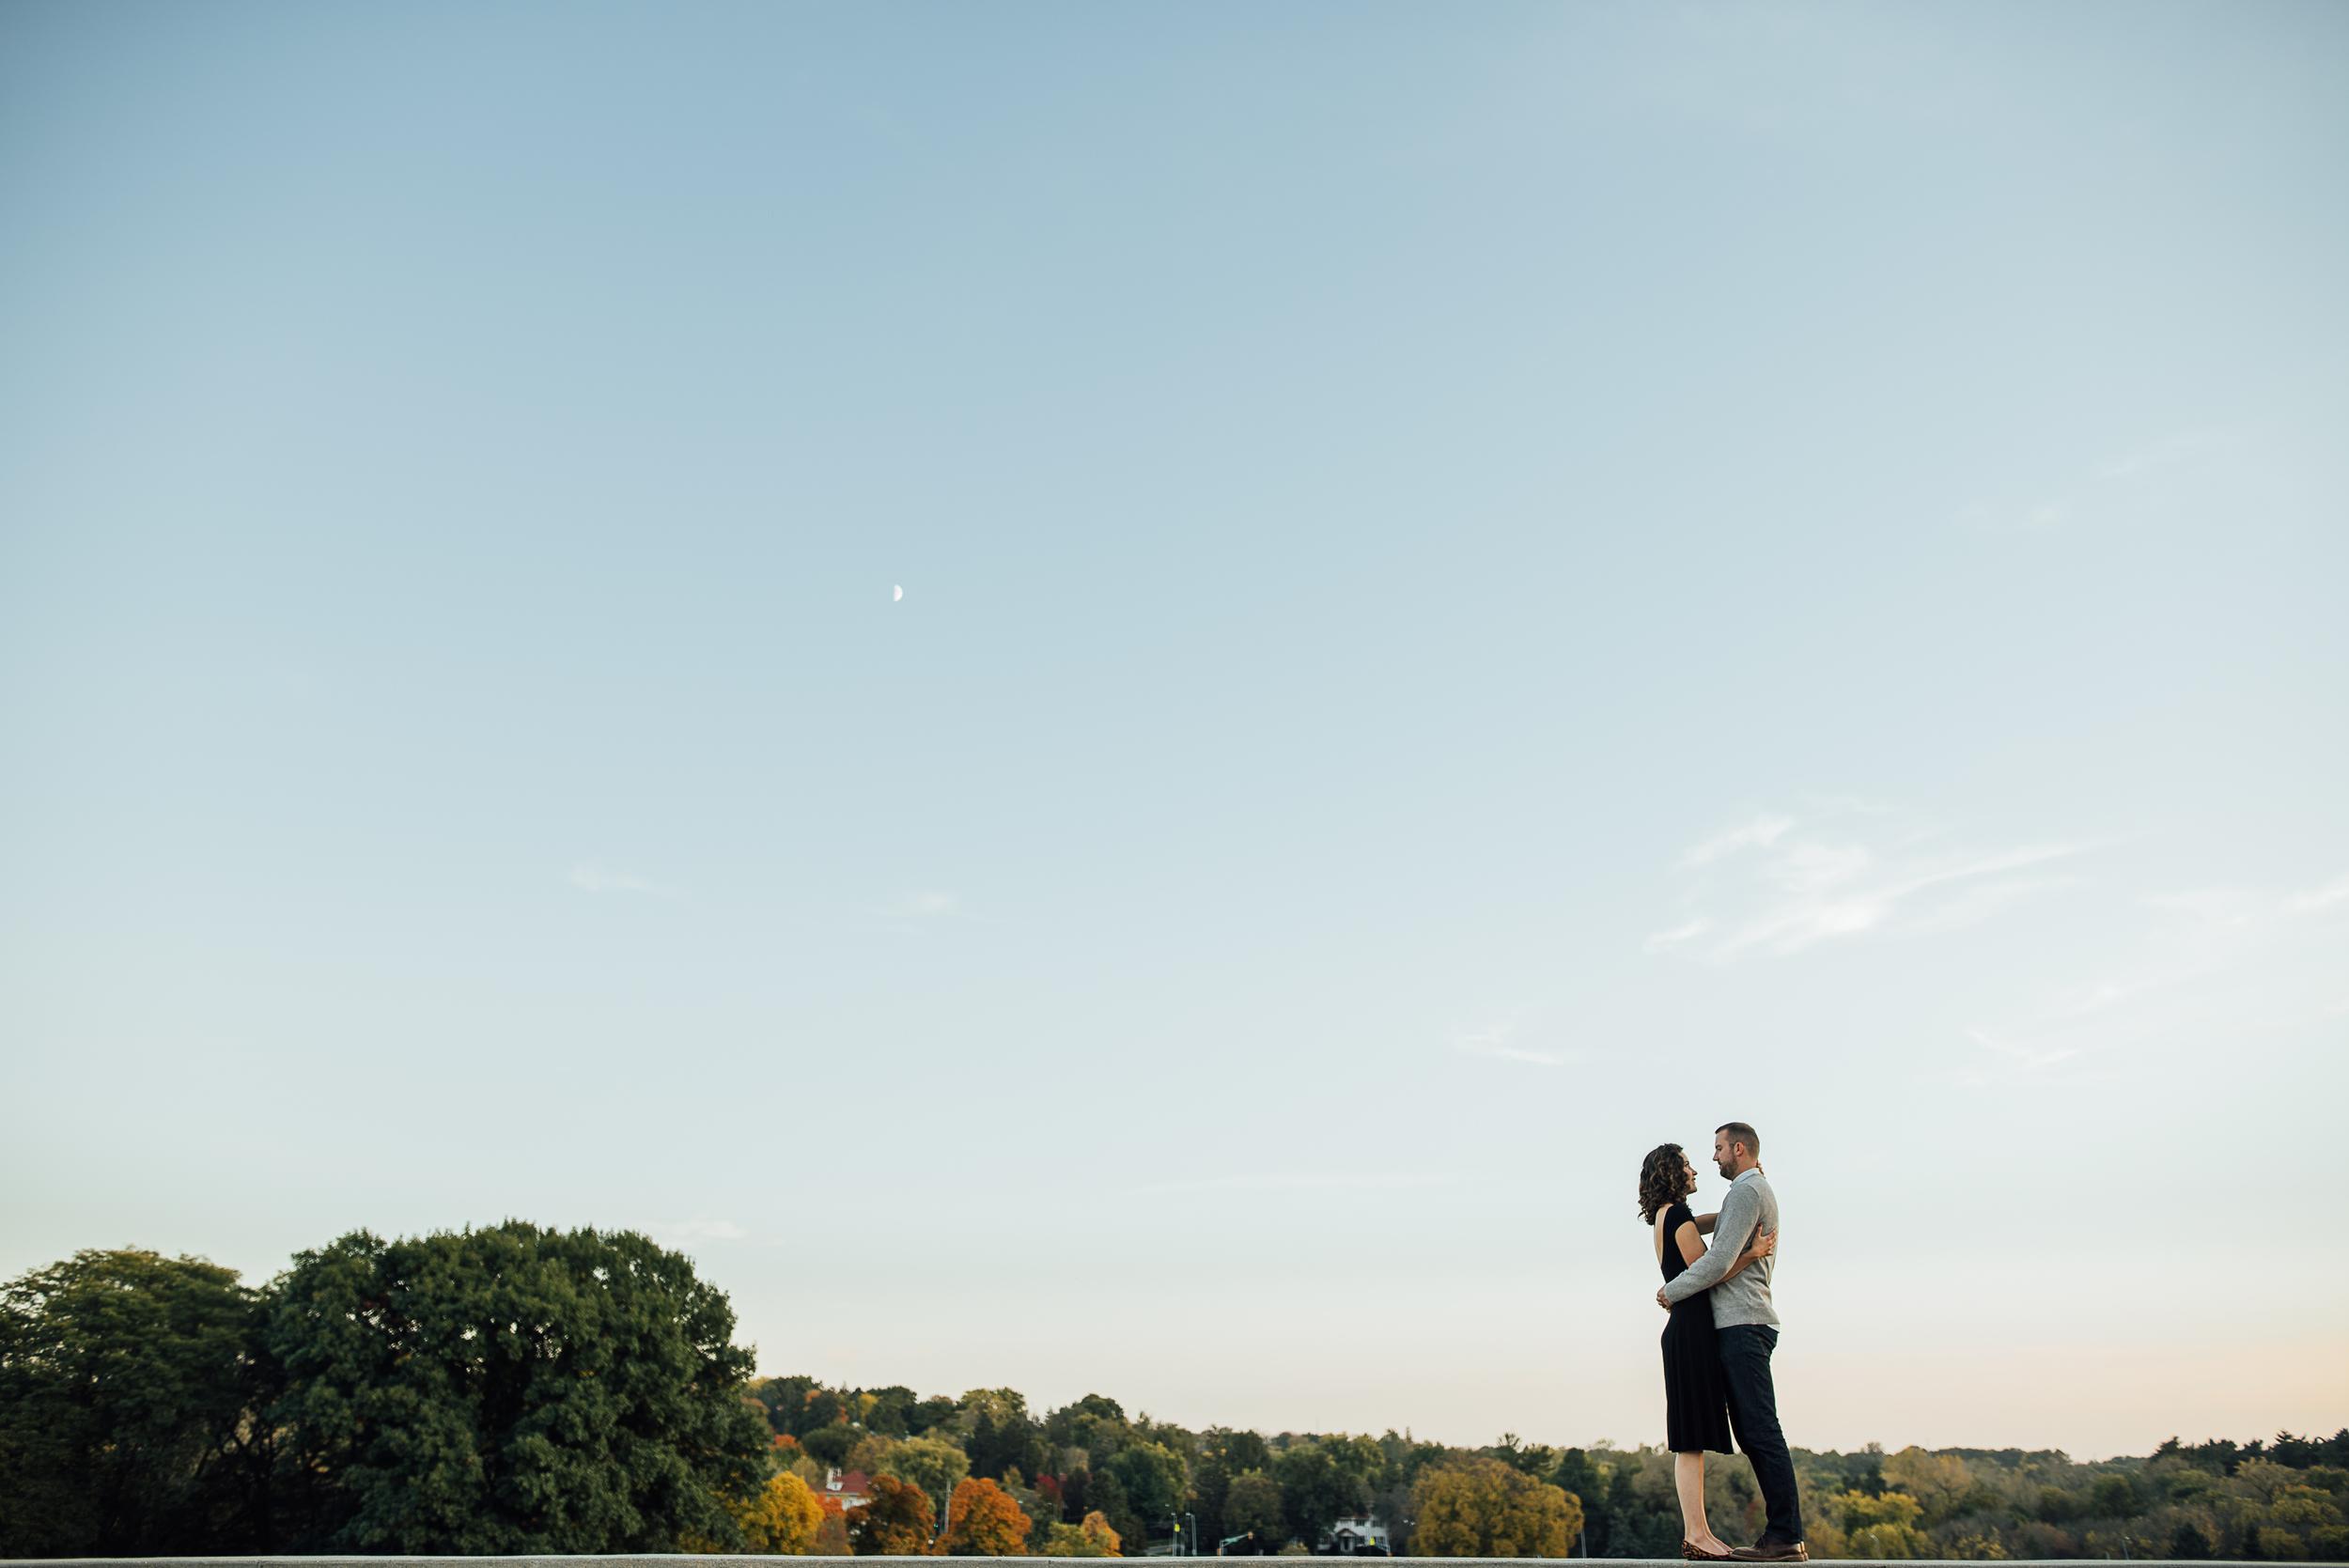 Matt x Anna | engaged